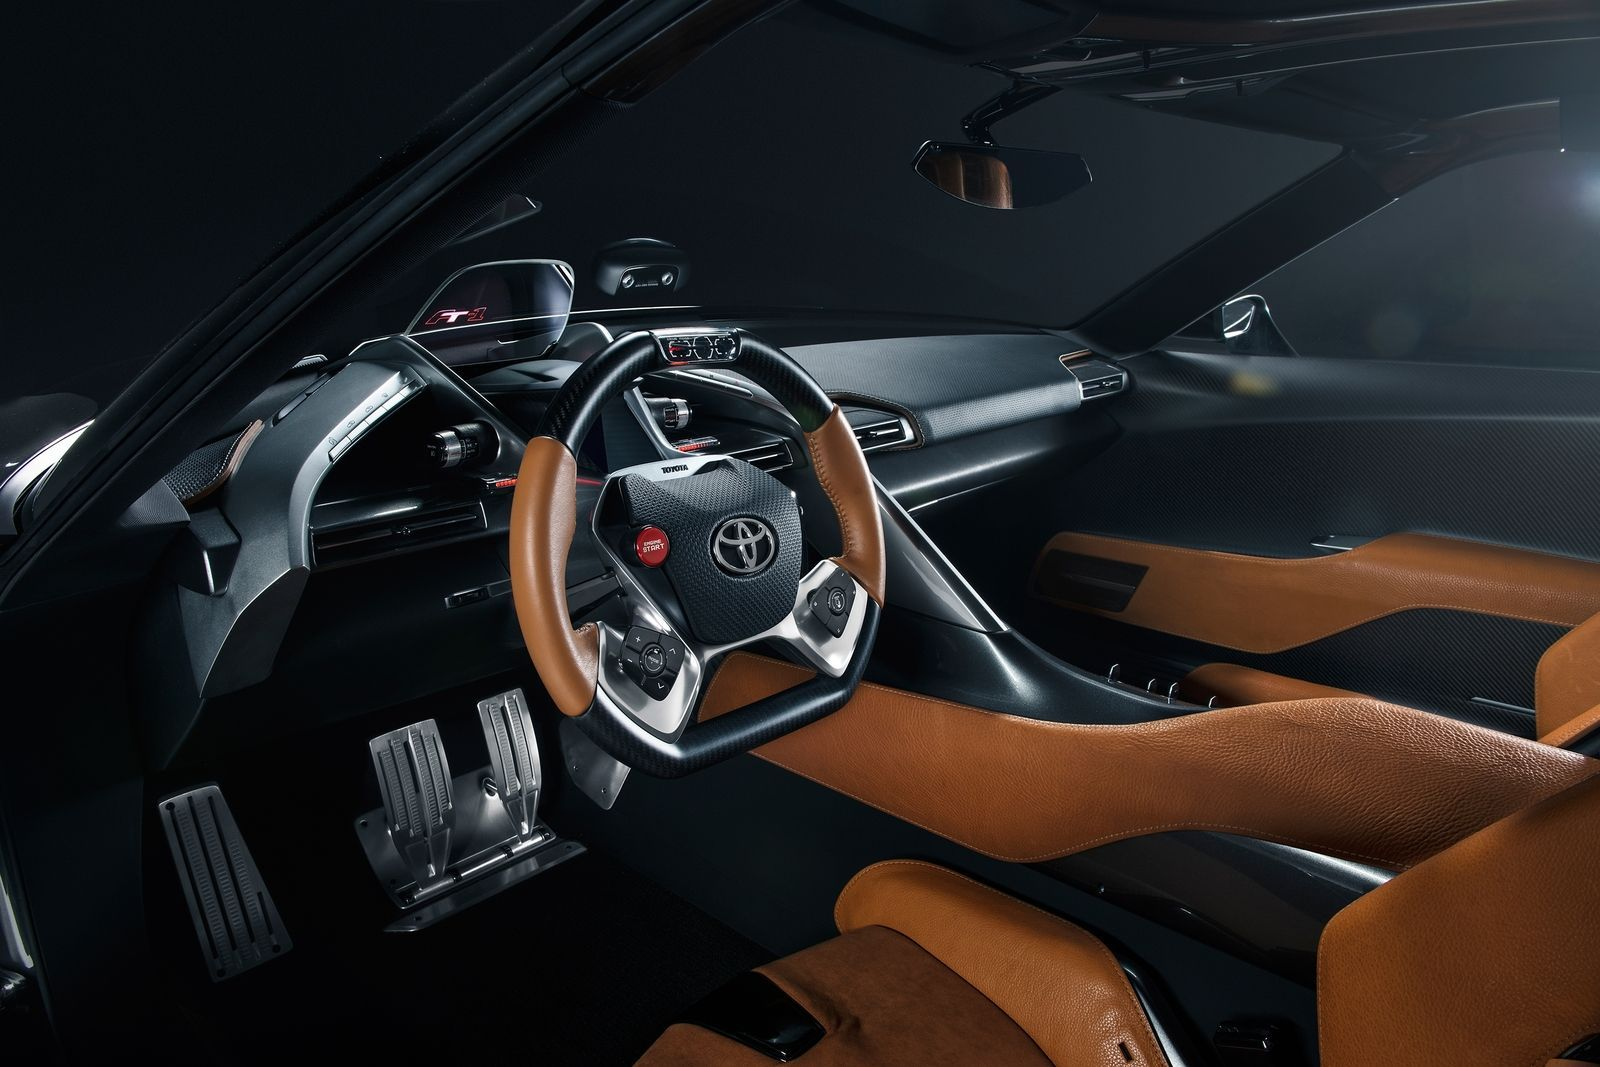 2020 Toyota Supra Everything We Know Toyota Supra Toyota Supra Turbo New Toyota Supra